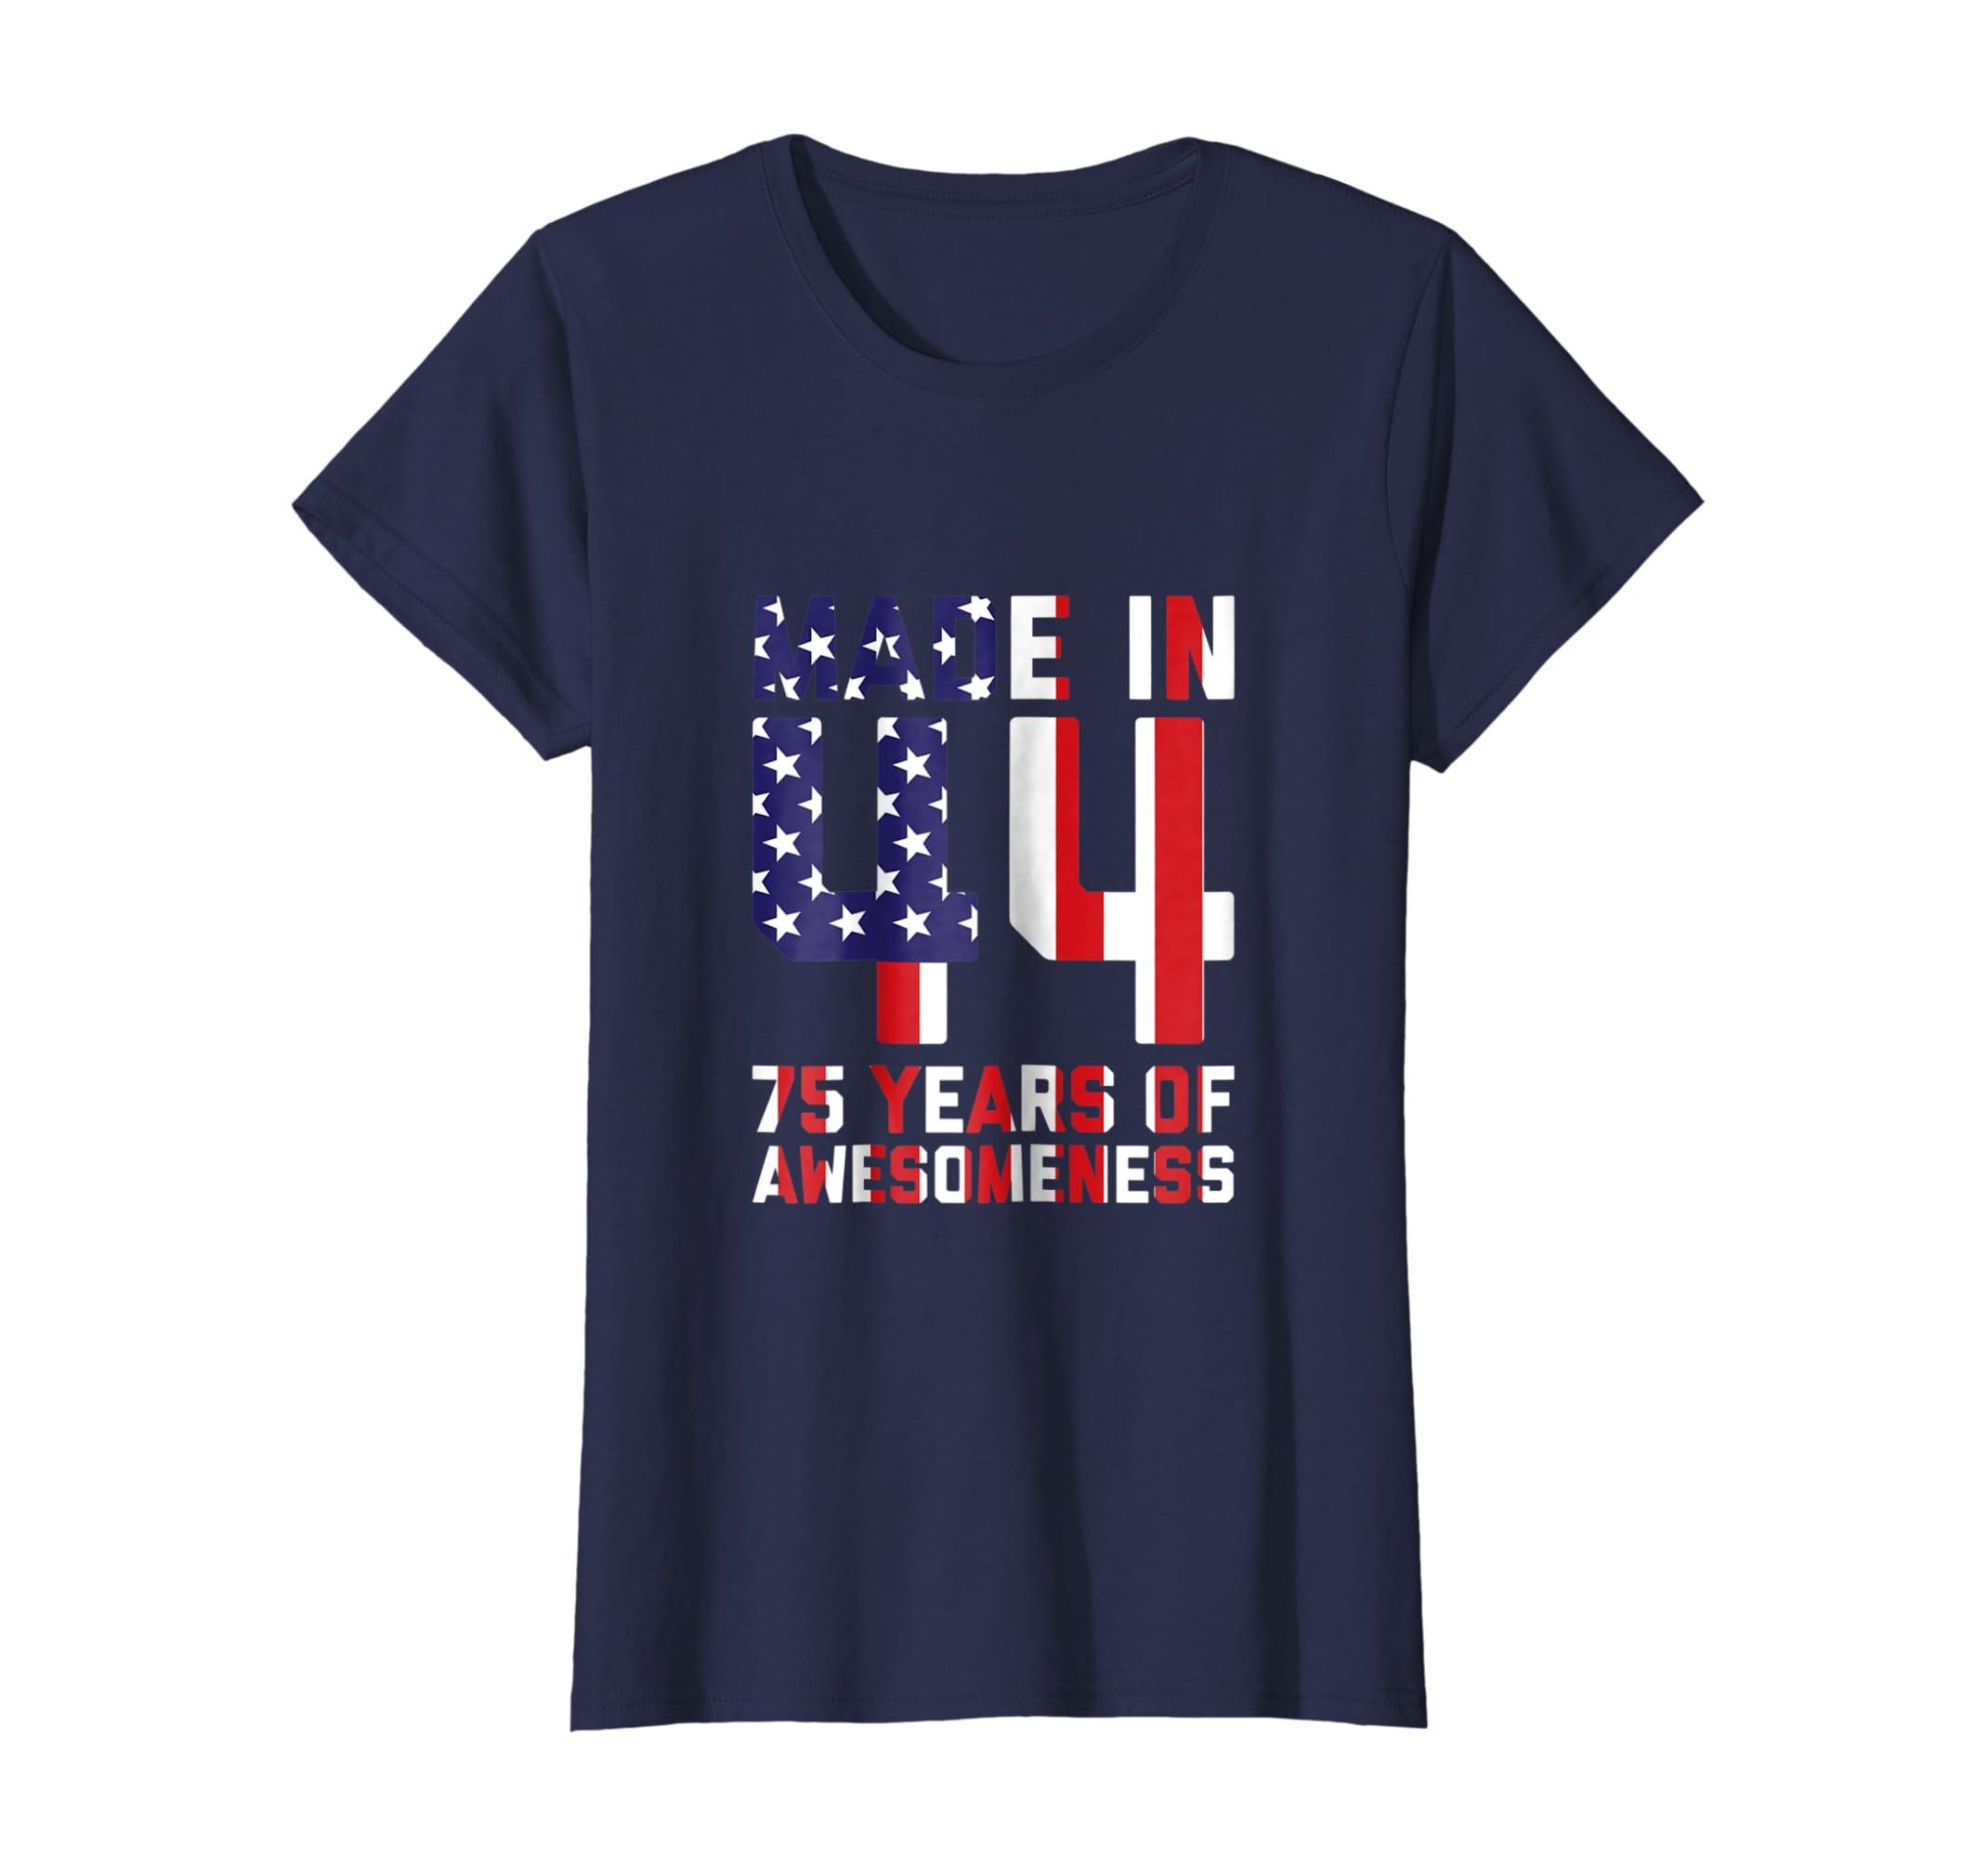 Amazon 75th Birthday Shirt For Men Gift 75 Year Old Grandpa Dad Clothing